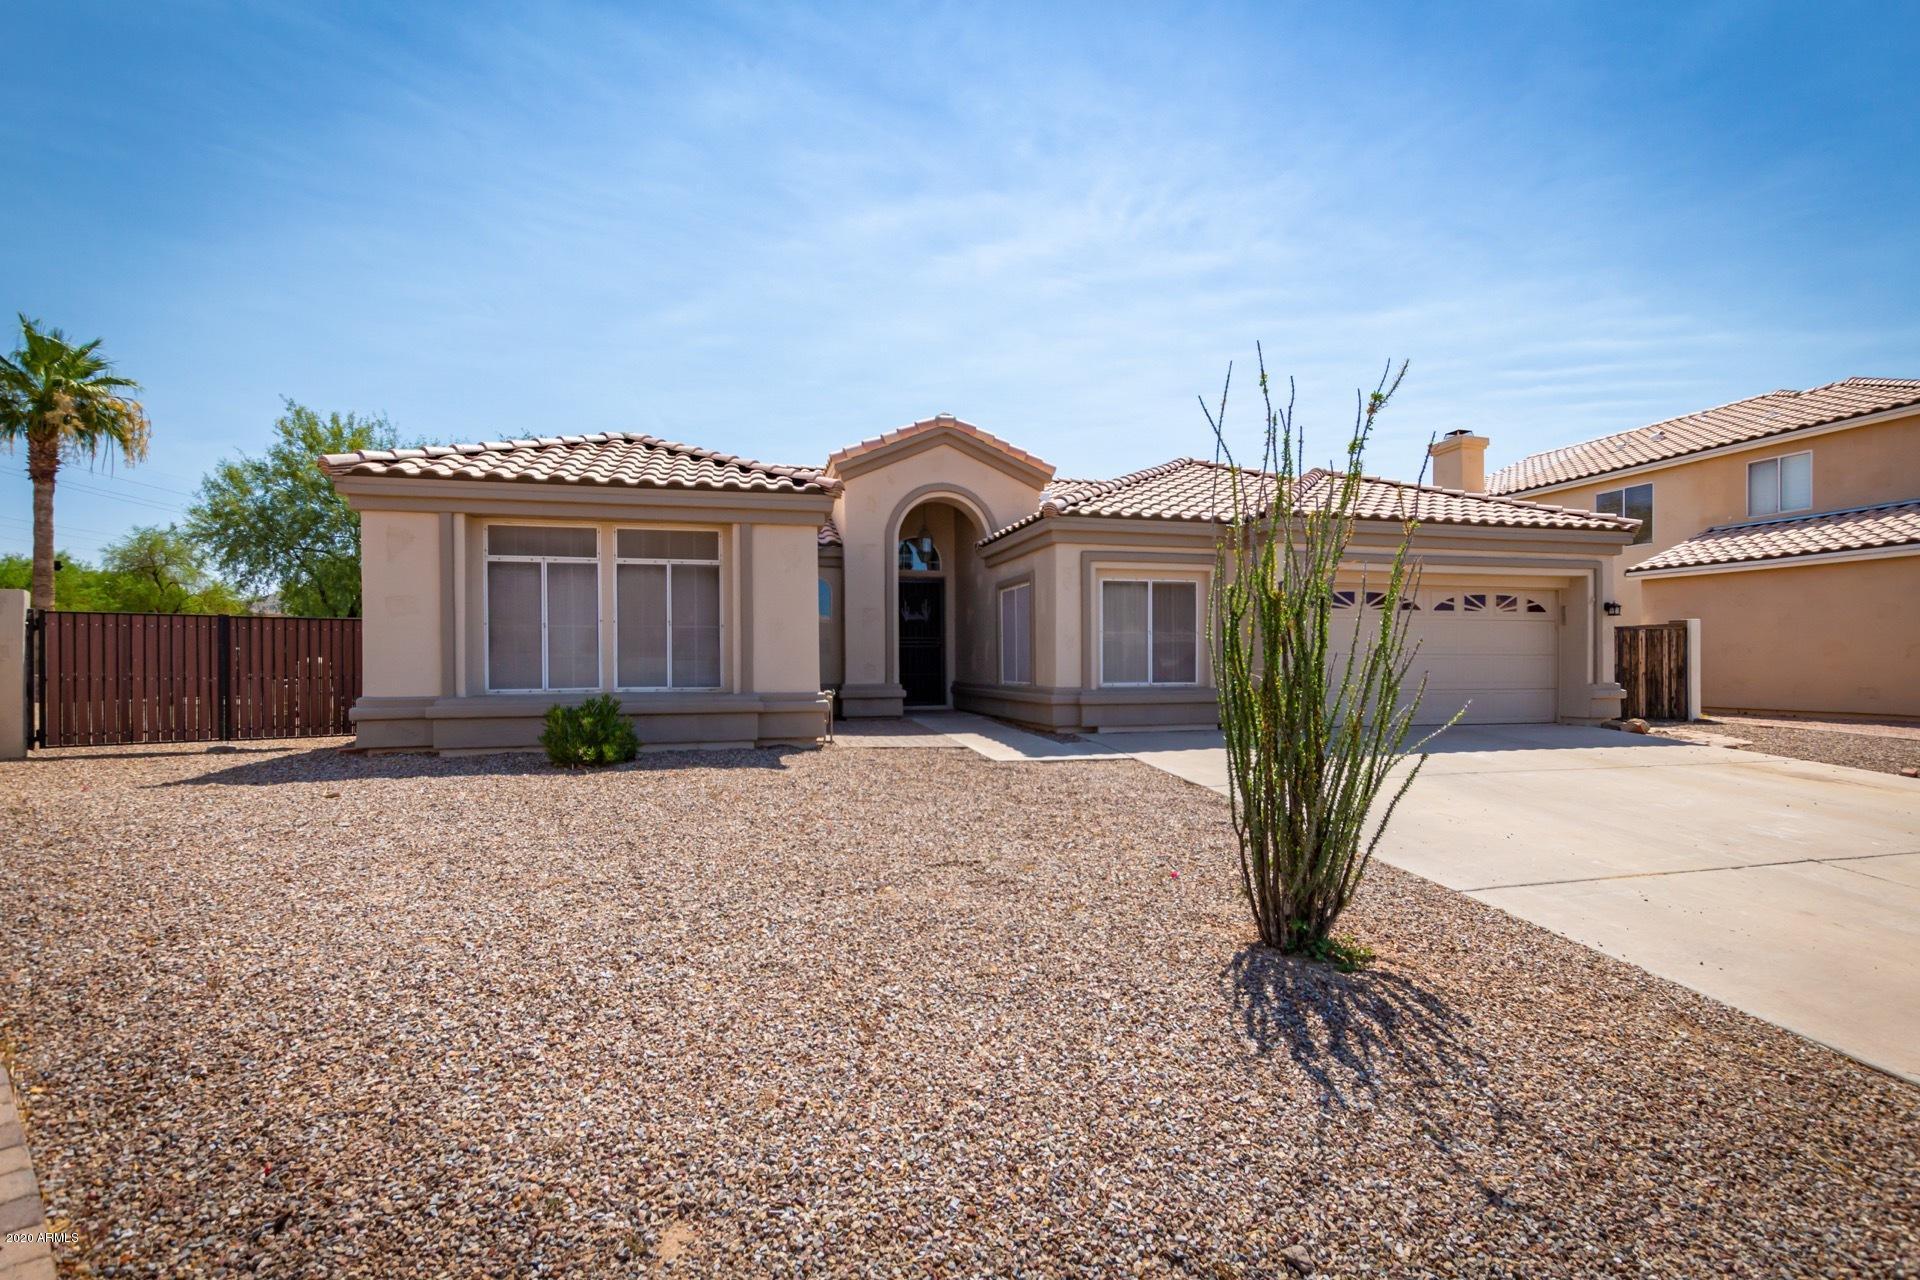 Photo of 3547 N REYNOLDS Circle, Mesa, AZ 85215